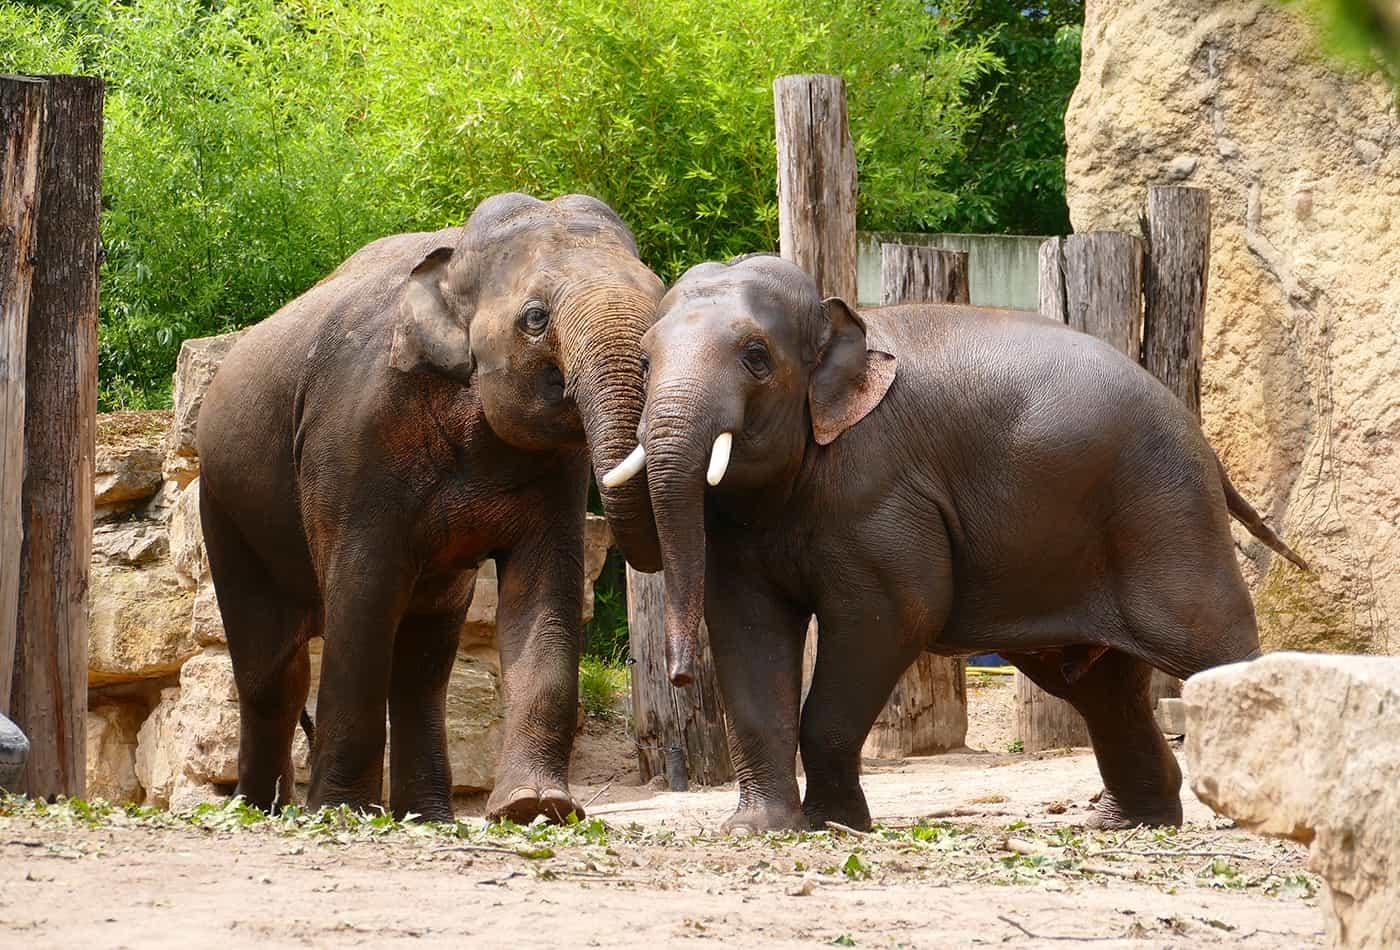 Elefanten im Zoo Heidelberg (Foto: Petra Medan)